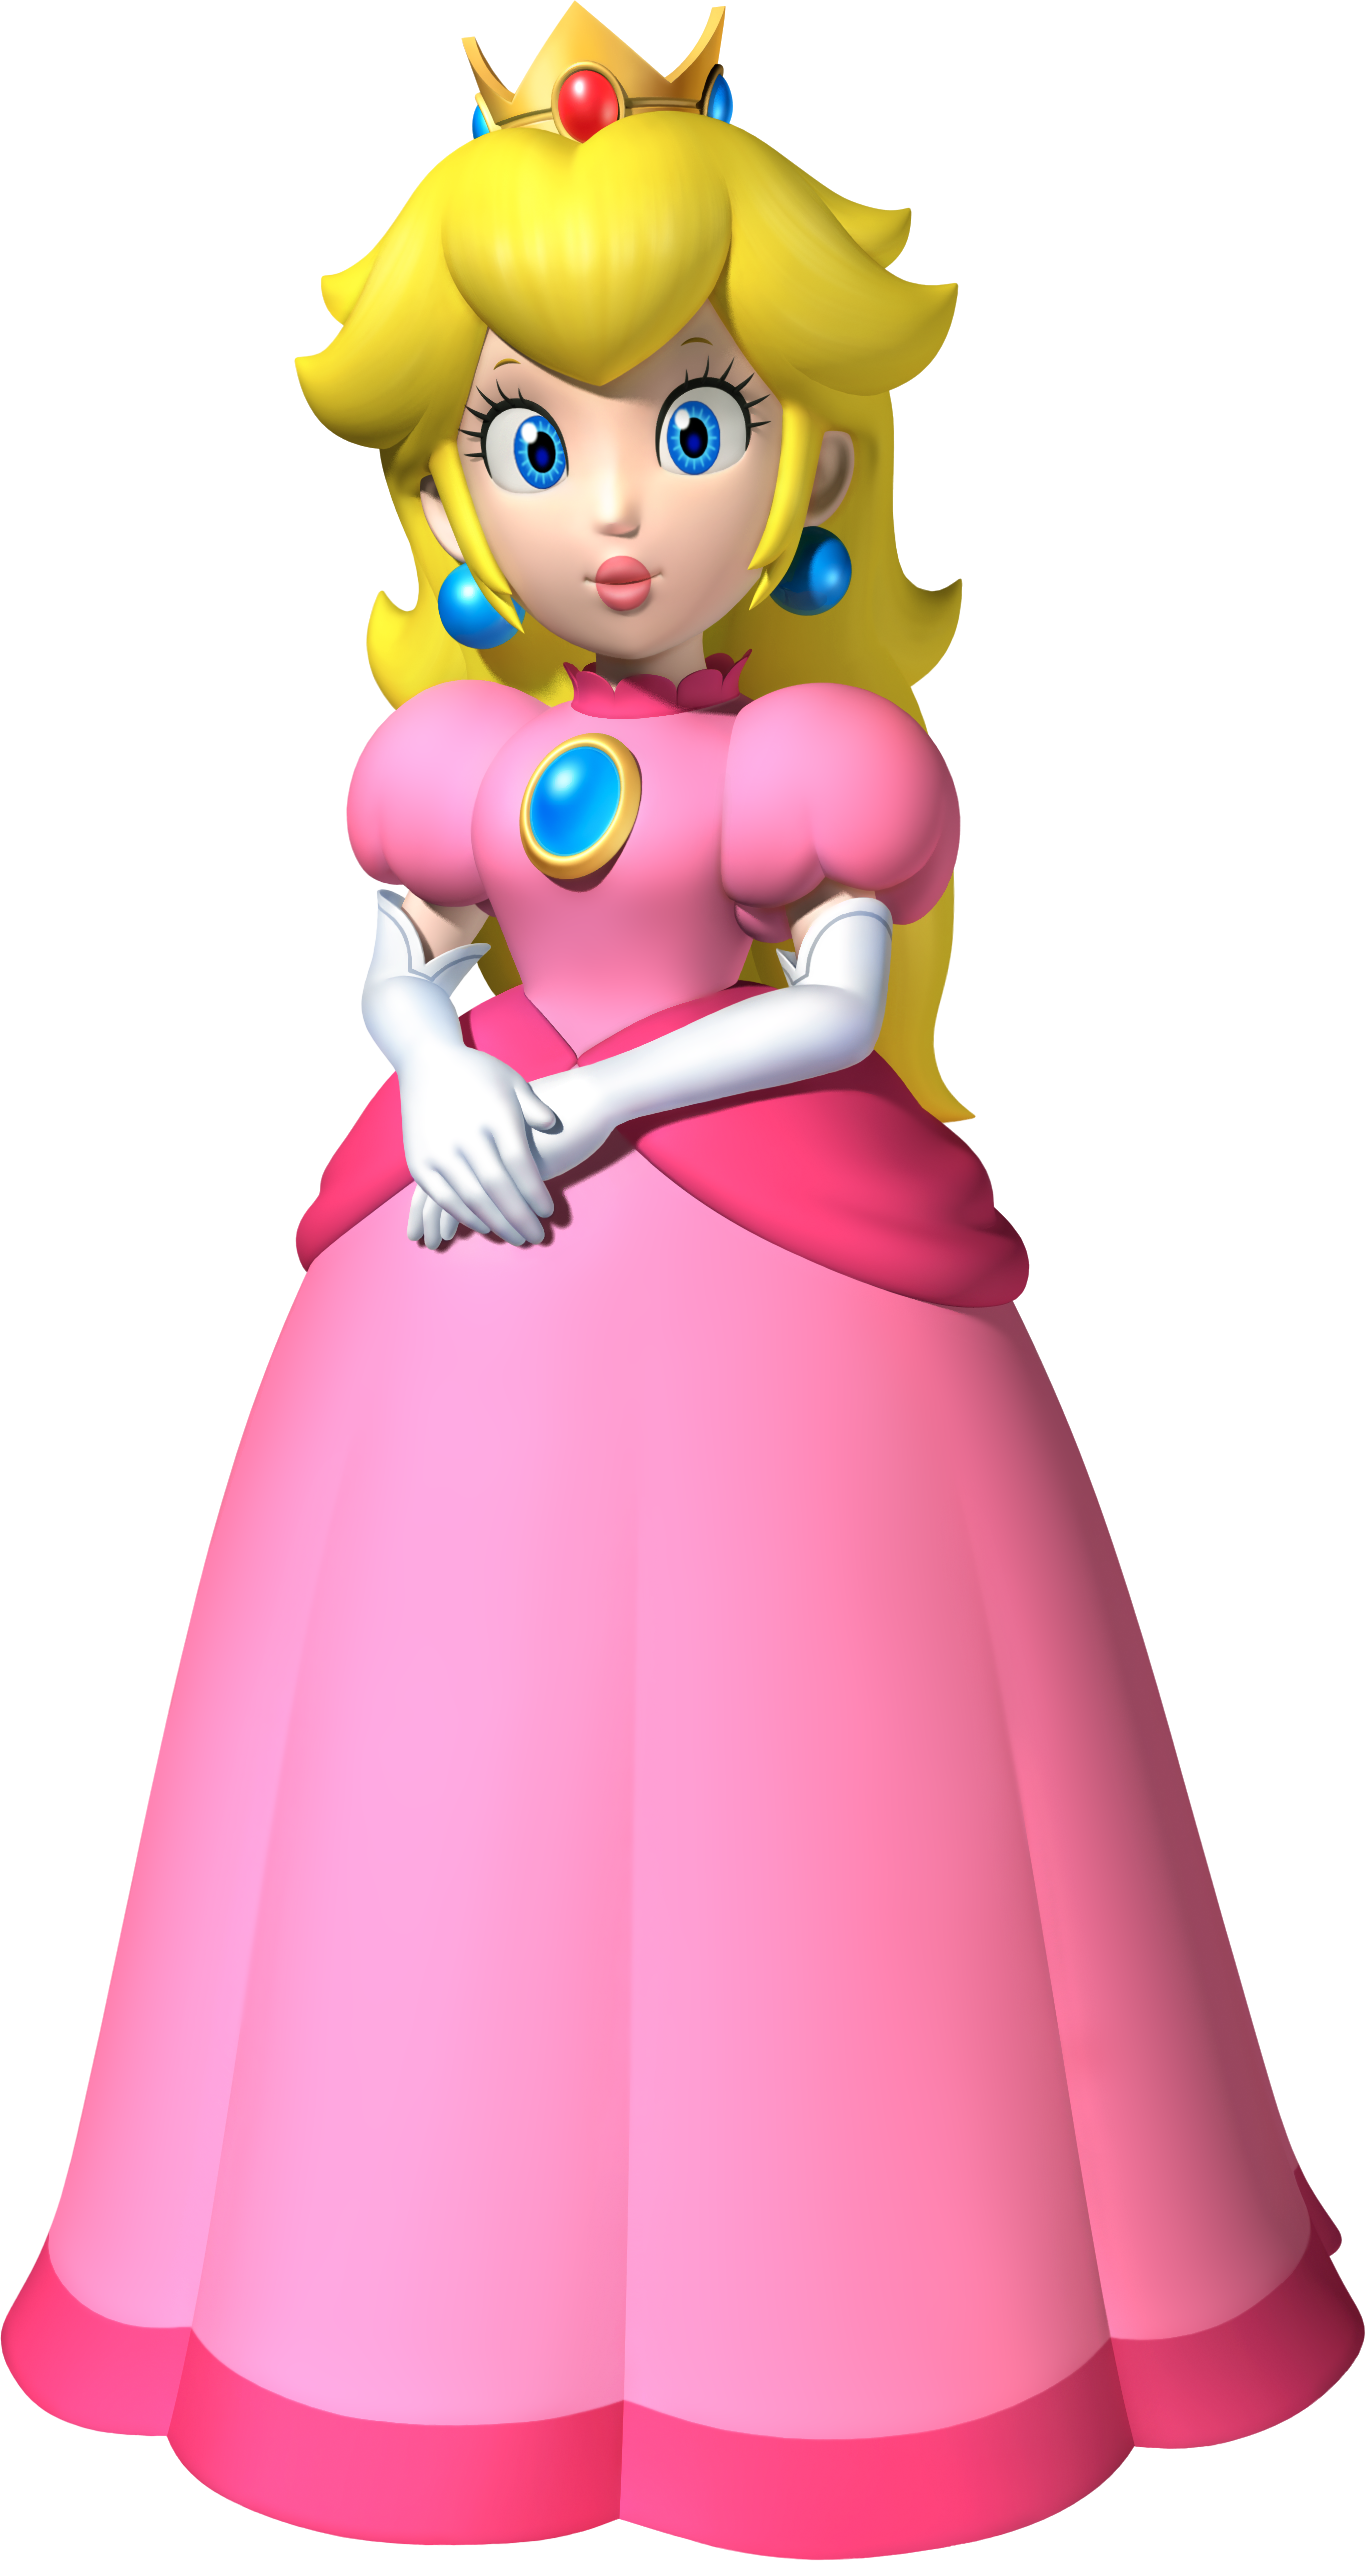 Princess Peach | Death Battle Fanon Wiki | FANDOM powered by Wikia